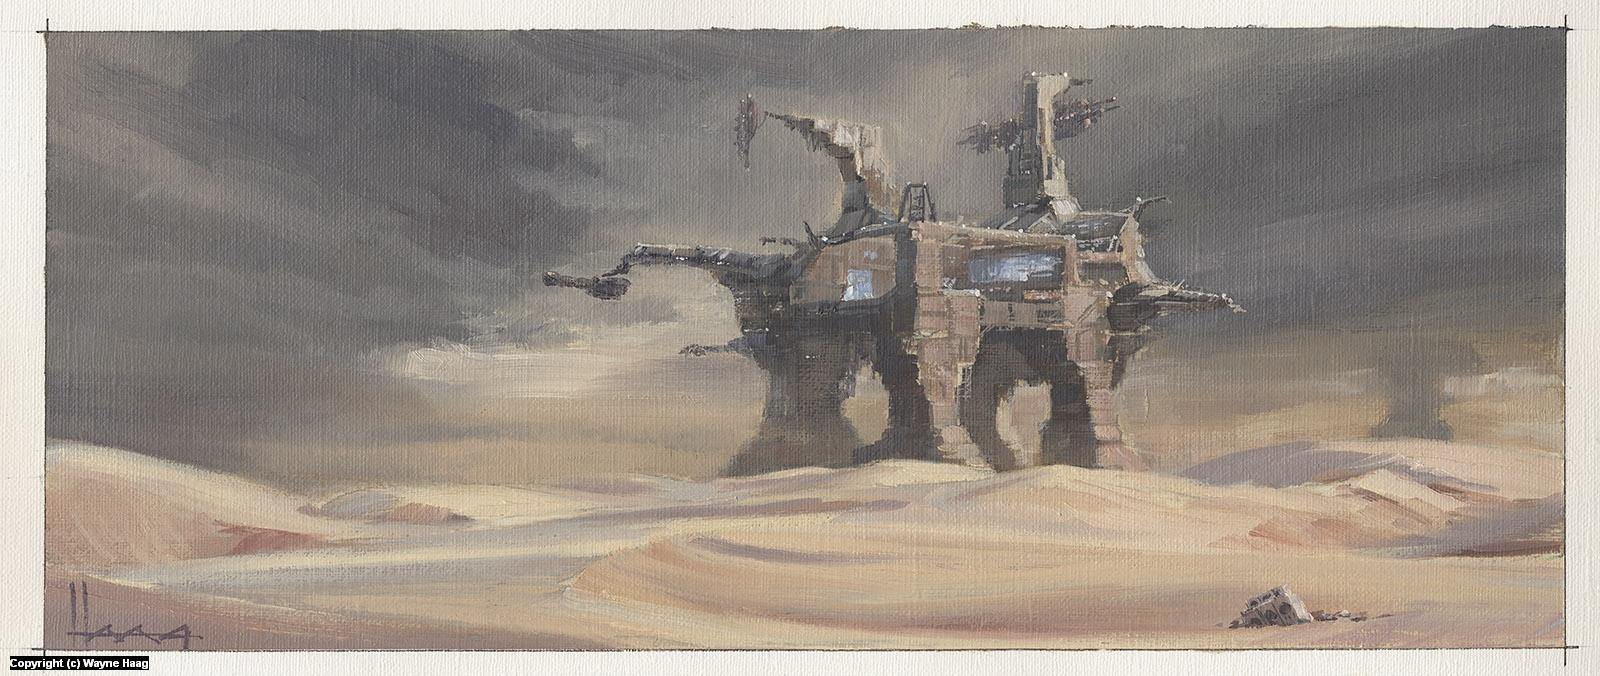 Outpost Artwork by Wayne Haag